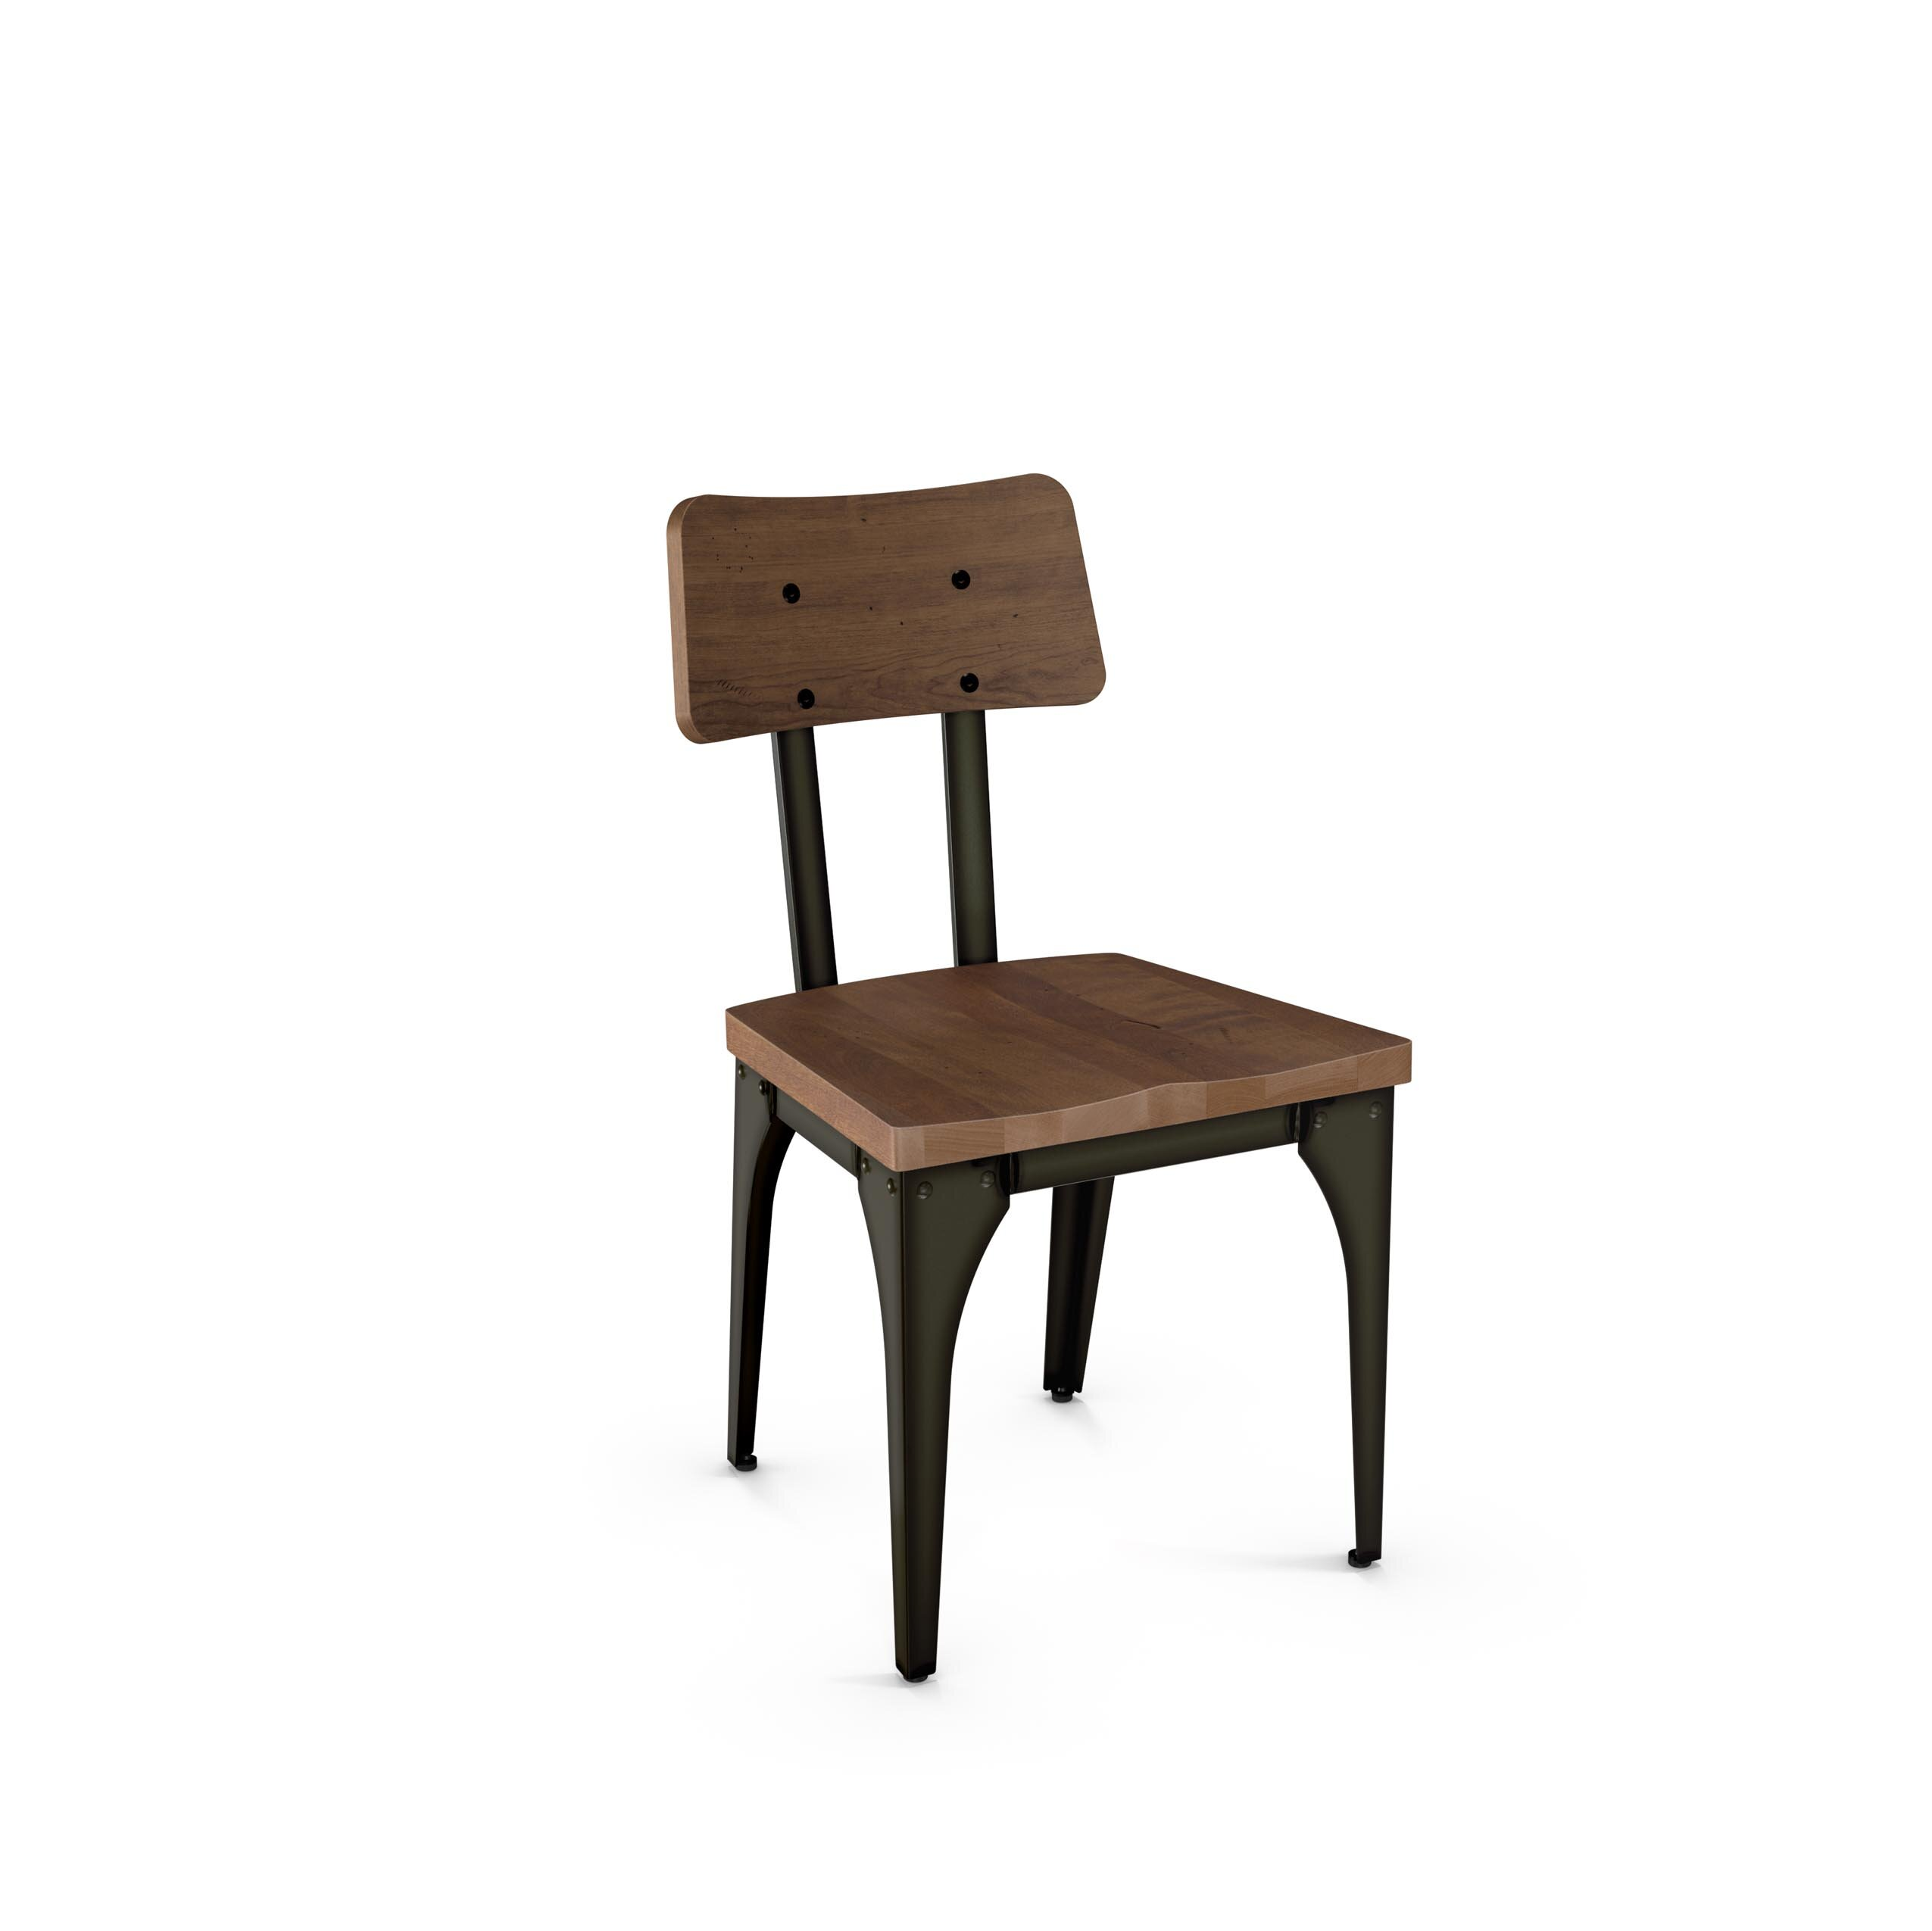 Ellenton Coffee Table With Storage: Gracie Oaks Ellenton Solid Wood Dining Chair